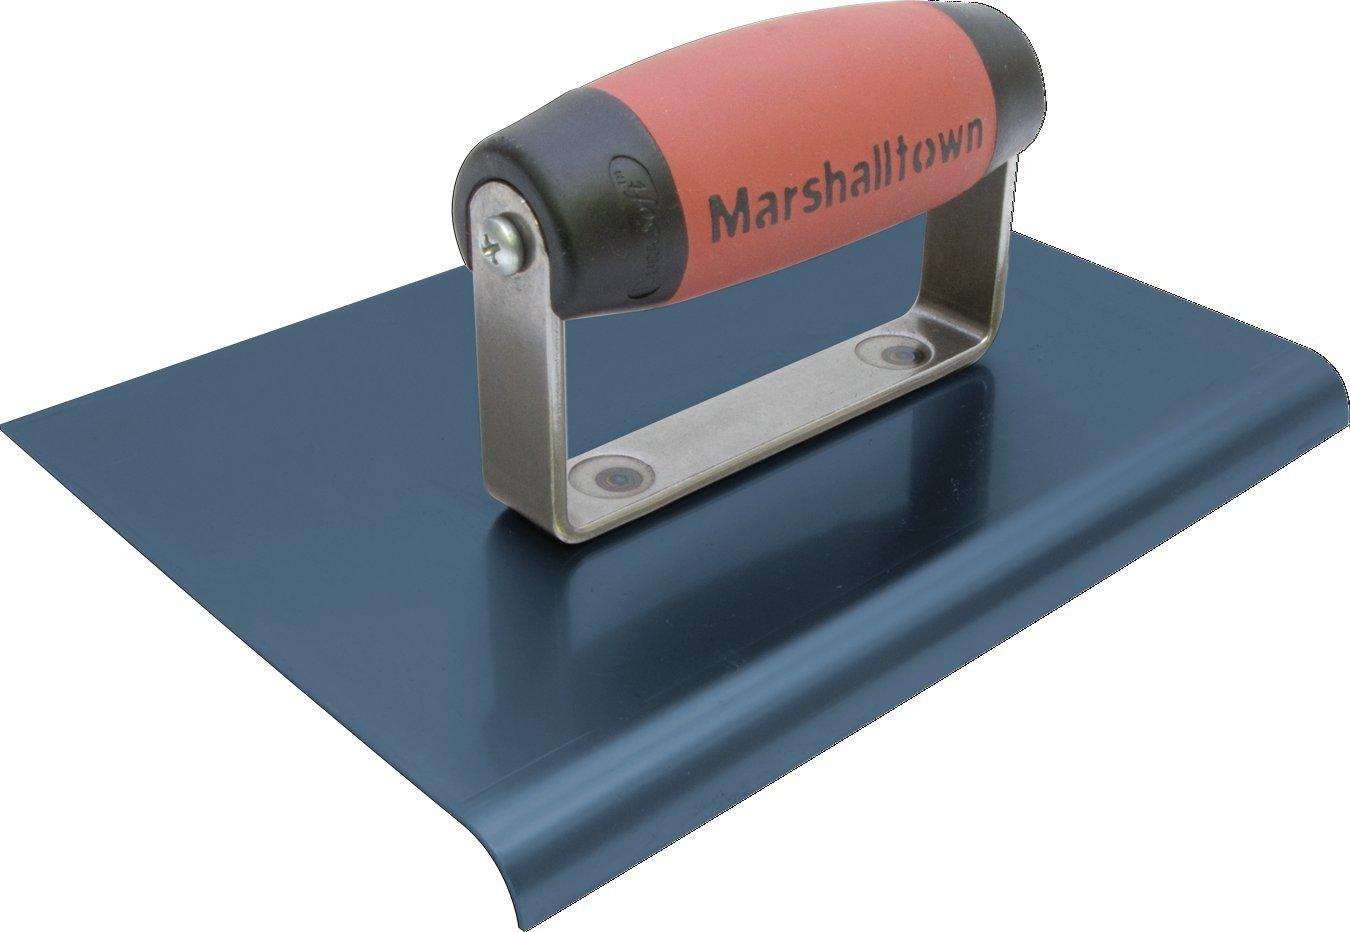 MARSHALLTOWN 167BD 9-Inch by 6-Inch The Premier Line Blue Steel Edger-3/4-Inch Radius 7/8-Inch Lip DuraSoft Handle